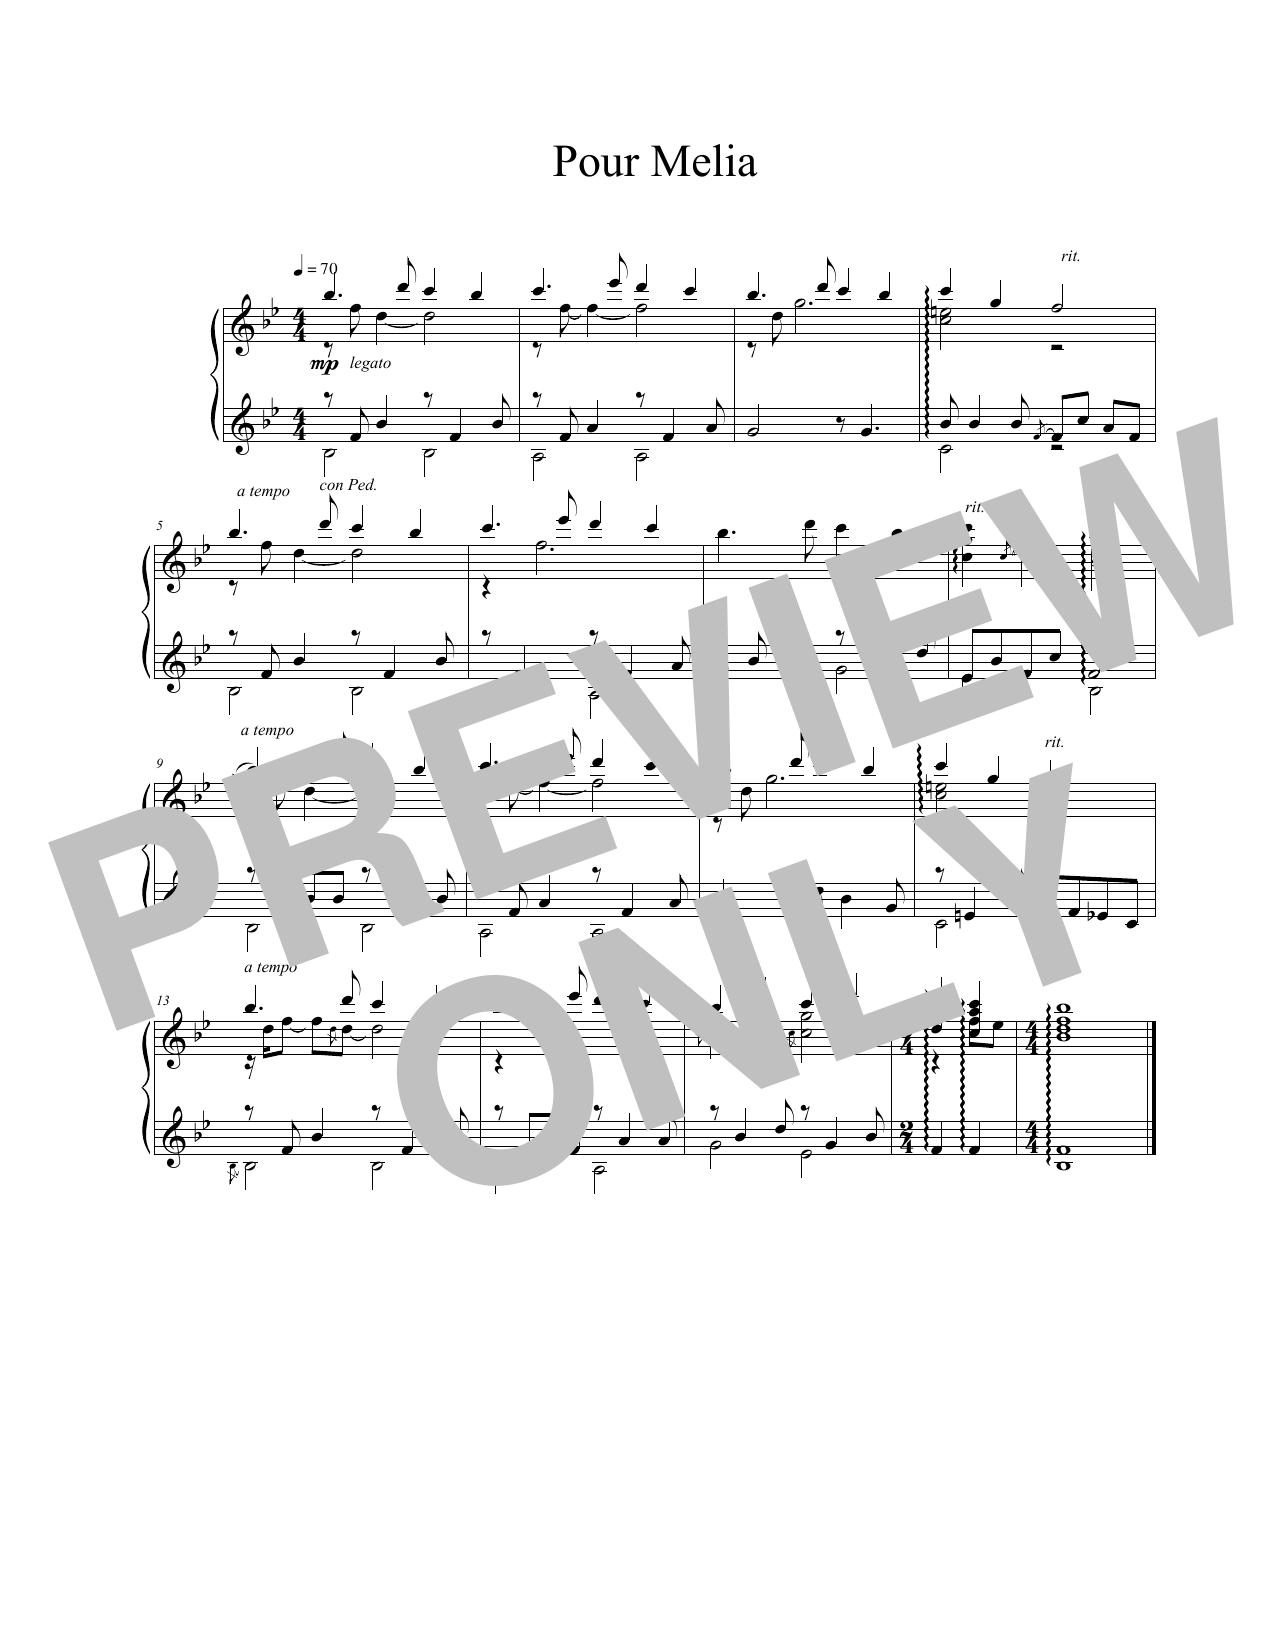 Vangelis Pour Melia sheet music notes and chords. Download Printable PDF.